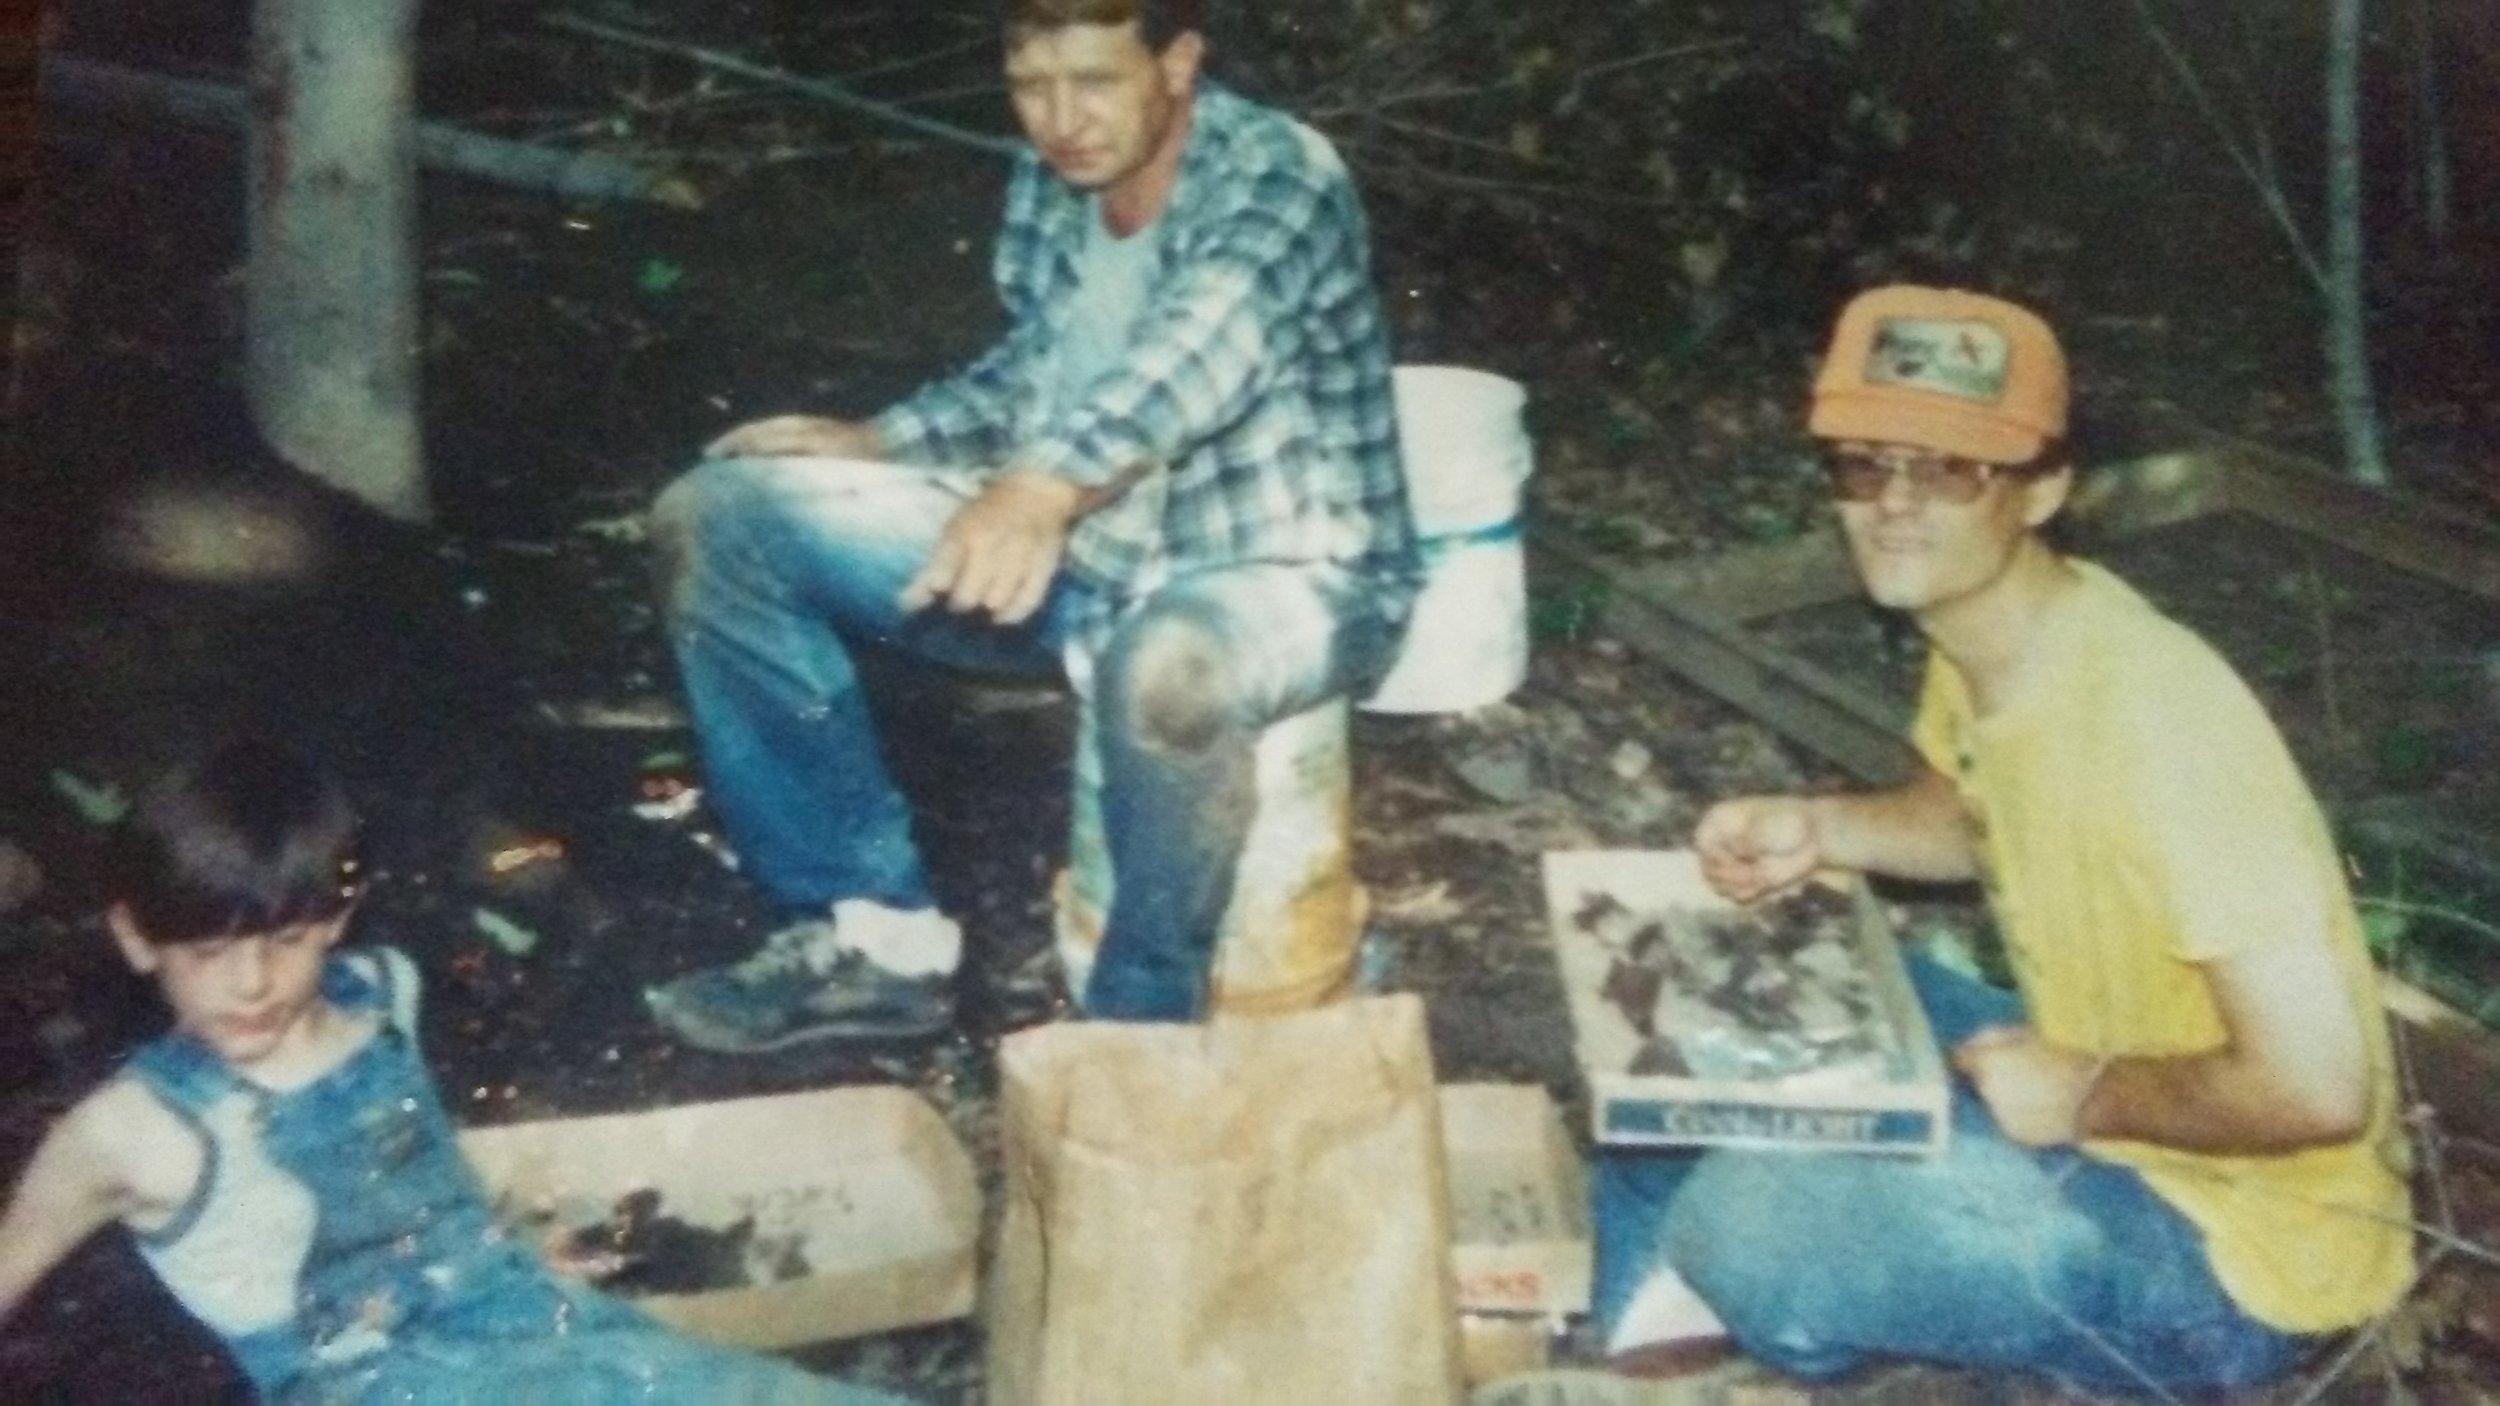 TJ Edwards, Les Gerkin, and Dr. Jeb Bowen circa 1989